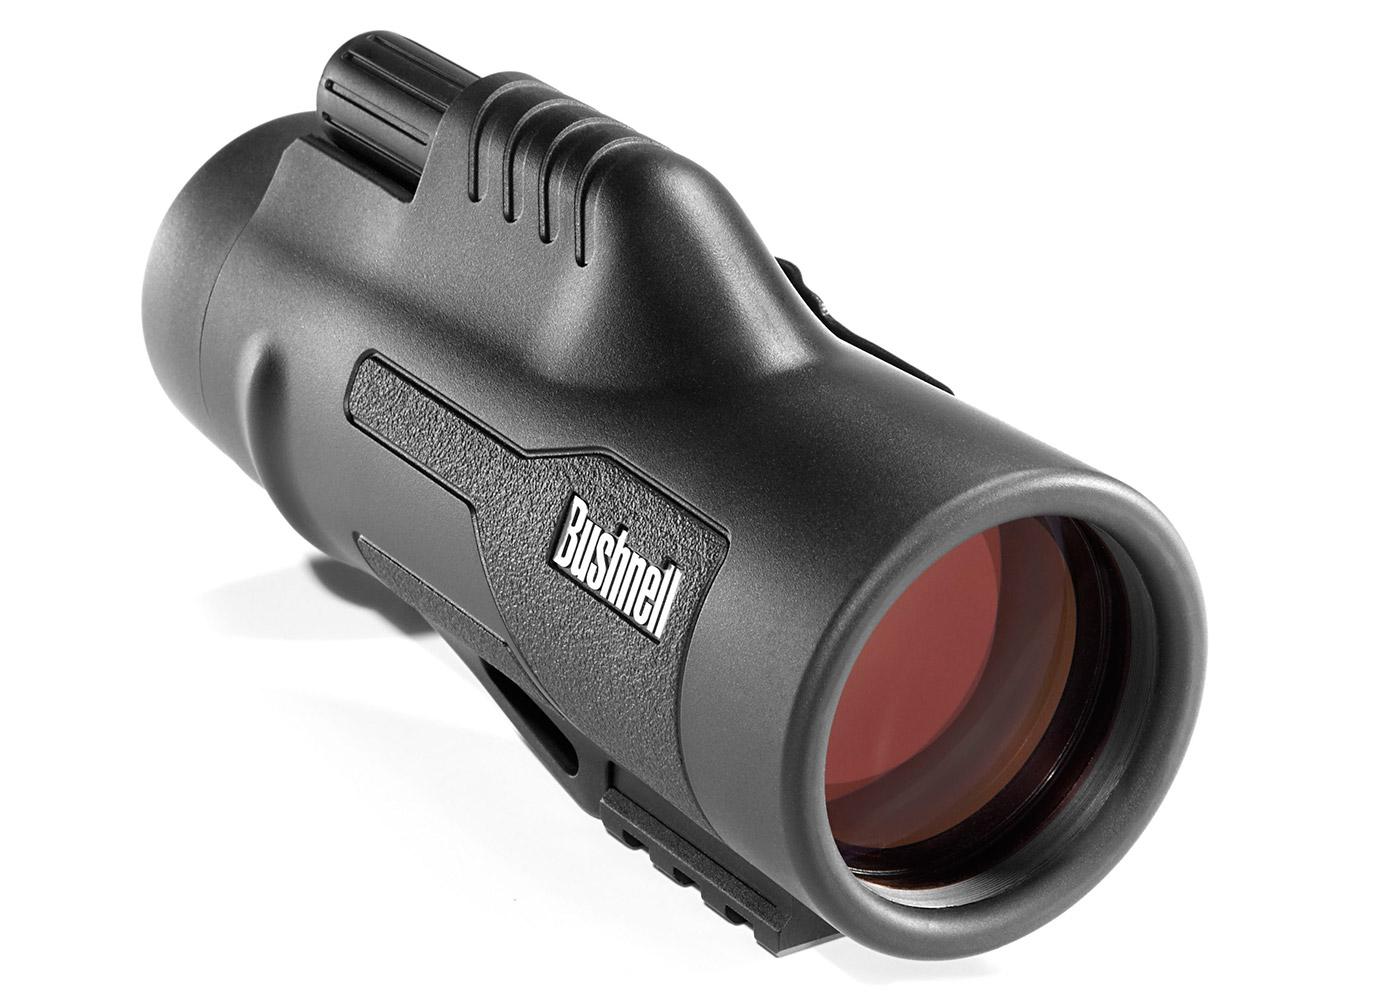 Bushnell Legend Ultra HD Monocular 10x42